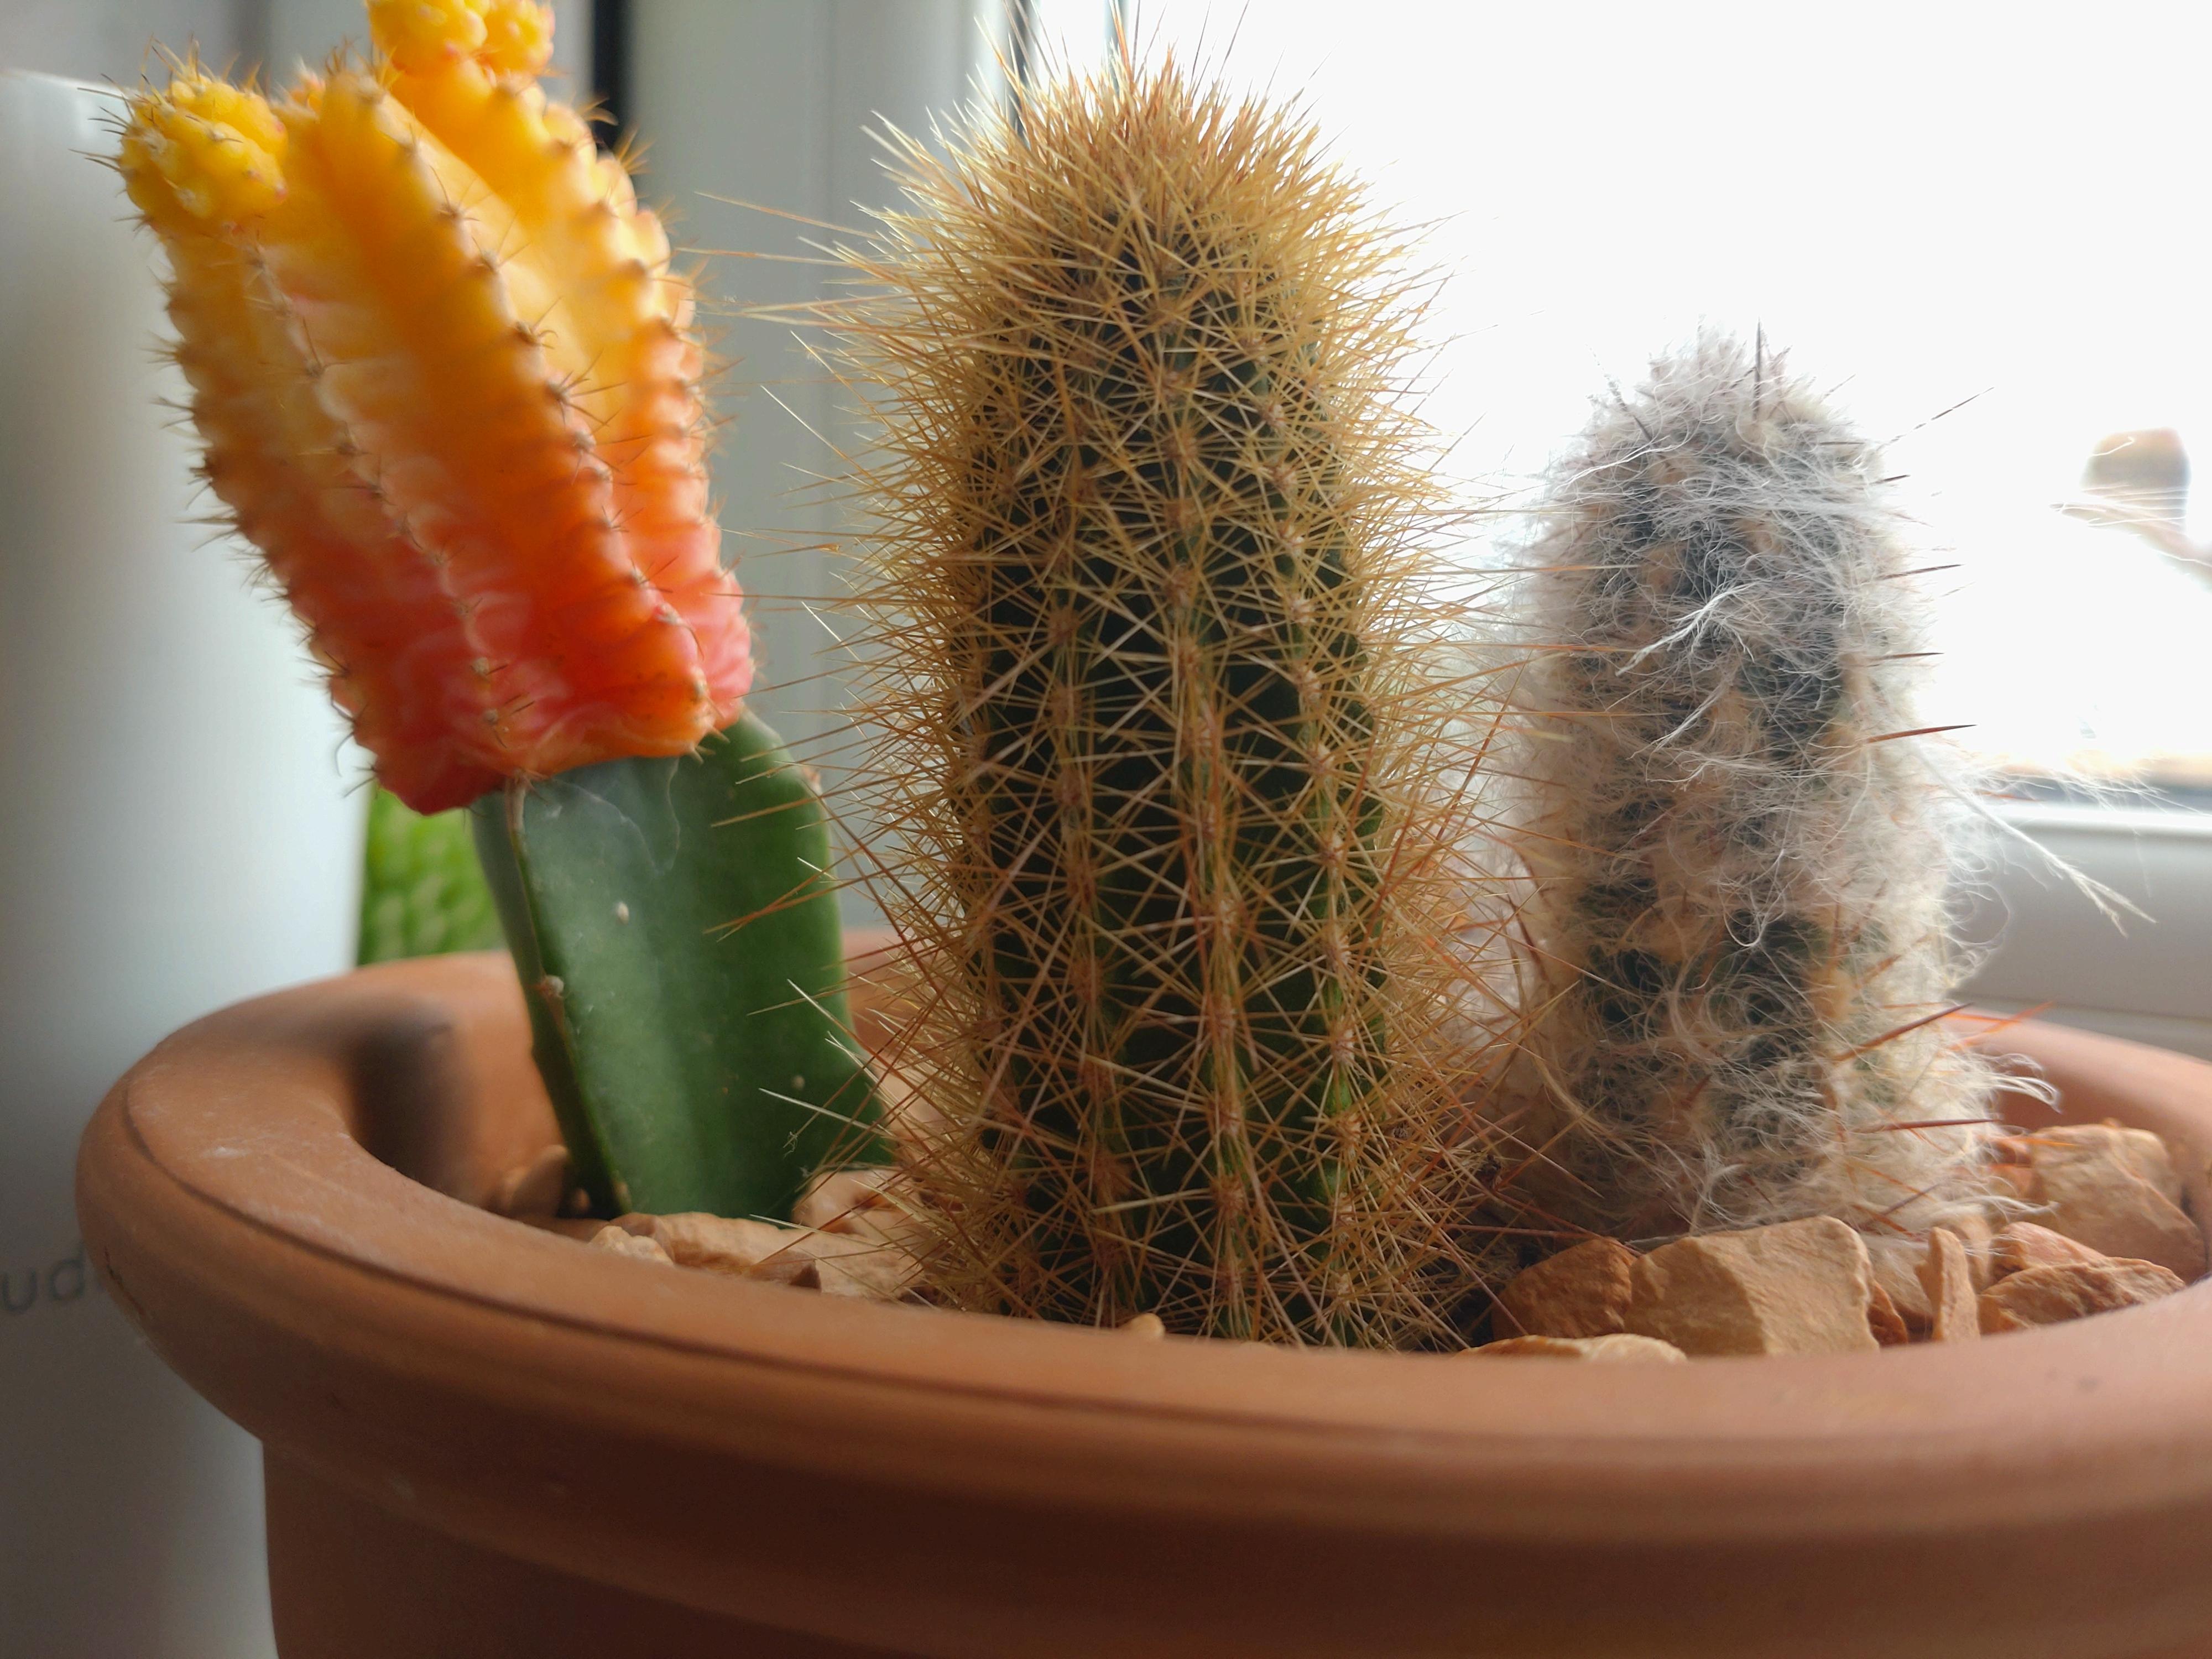 A cactus shot on the Xperia 10 III